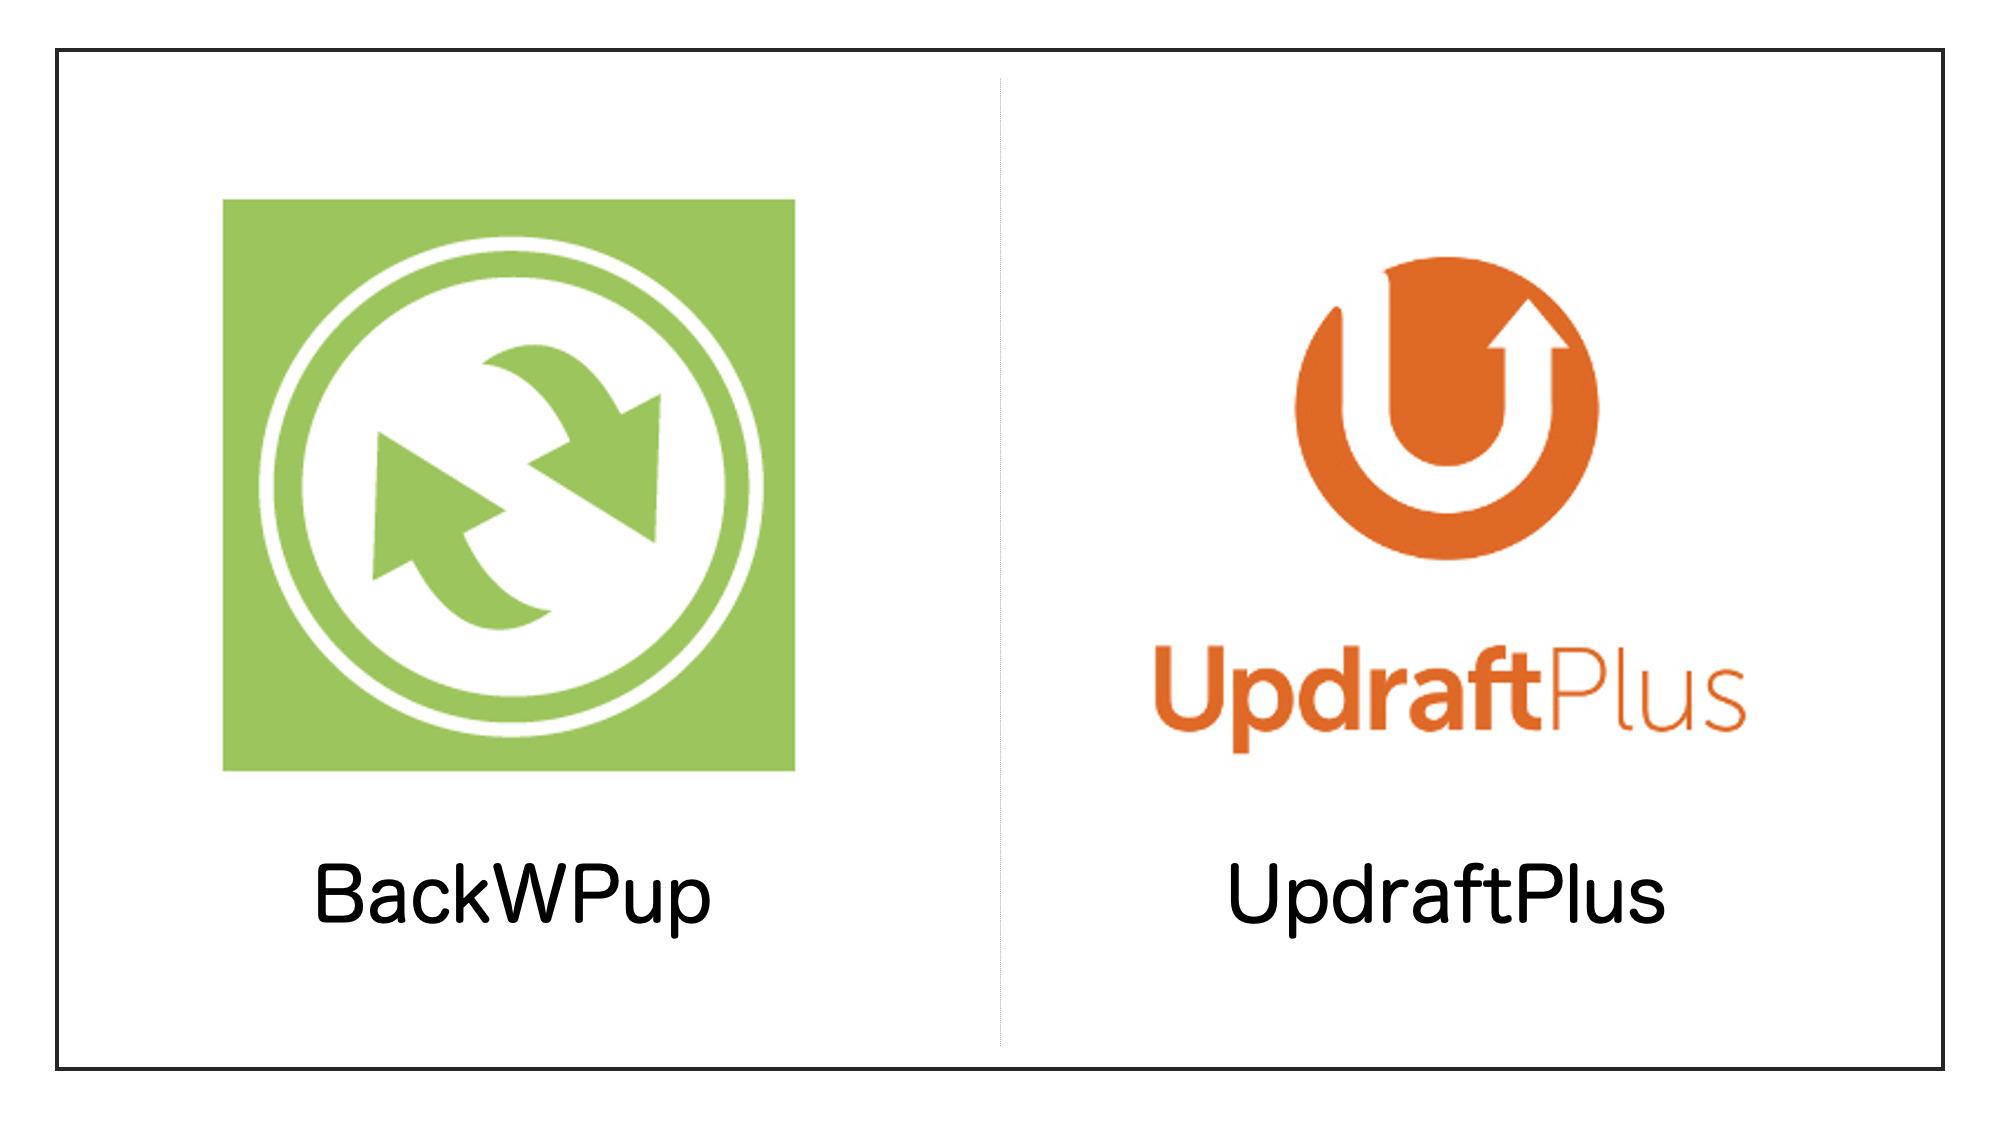 BackWPupとUpdraftPlus